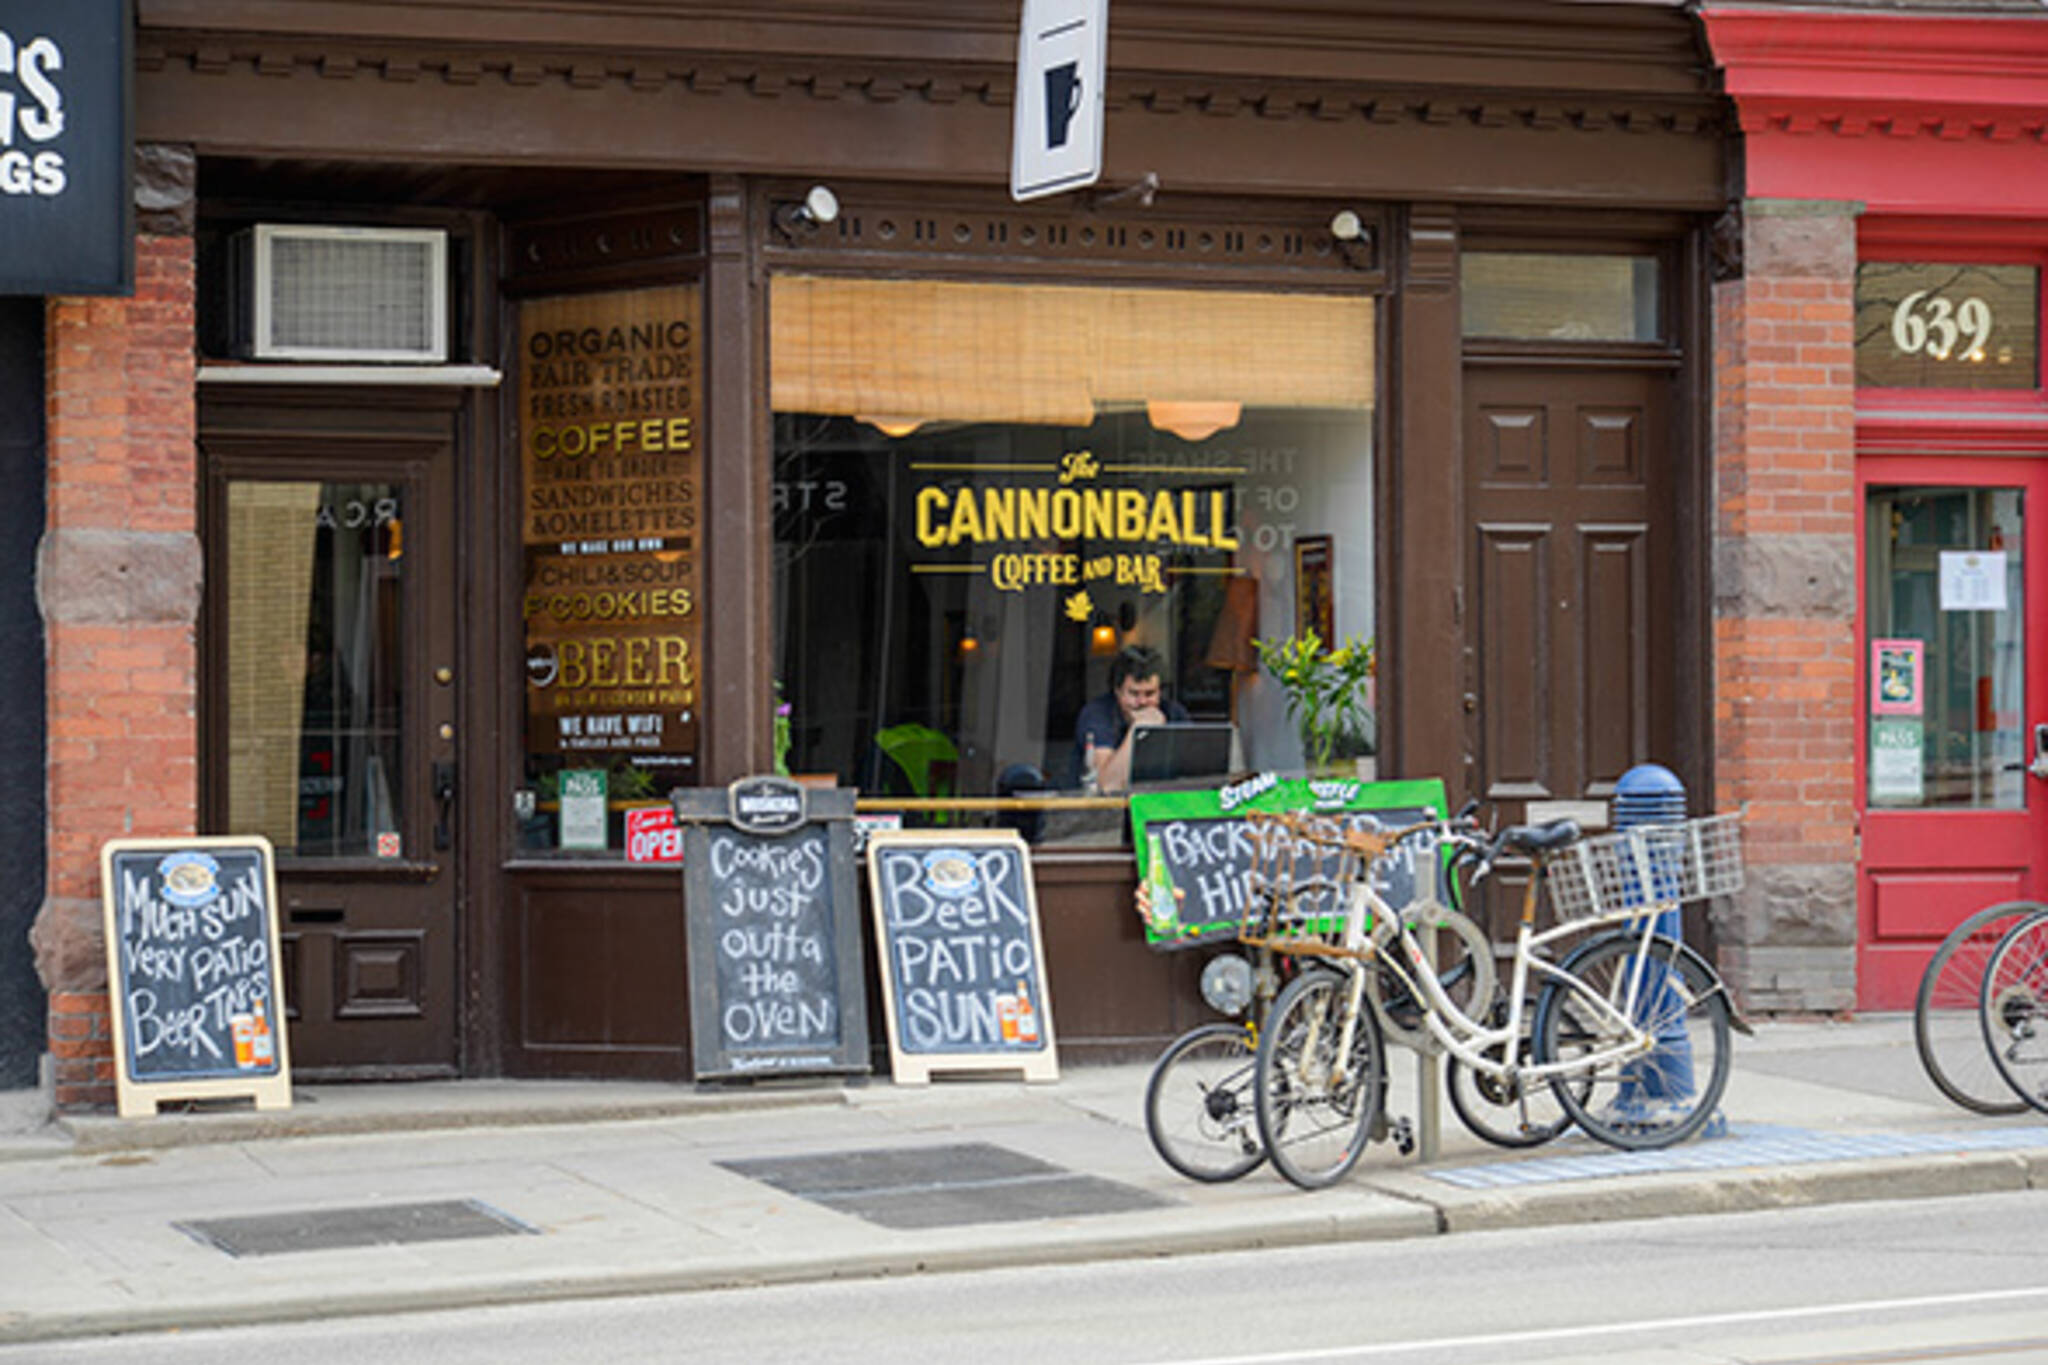 Cannonball Toronto